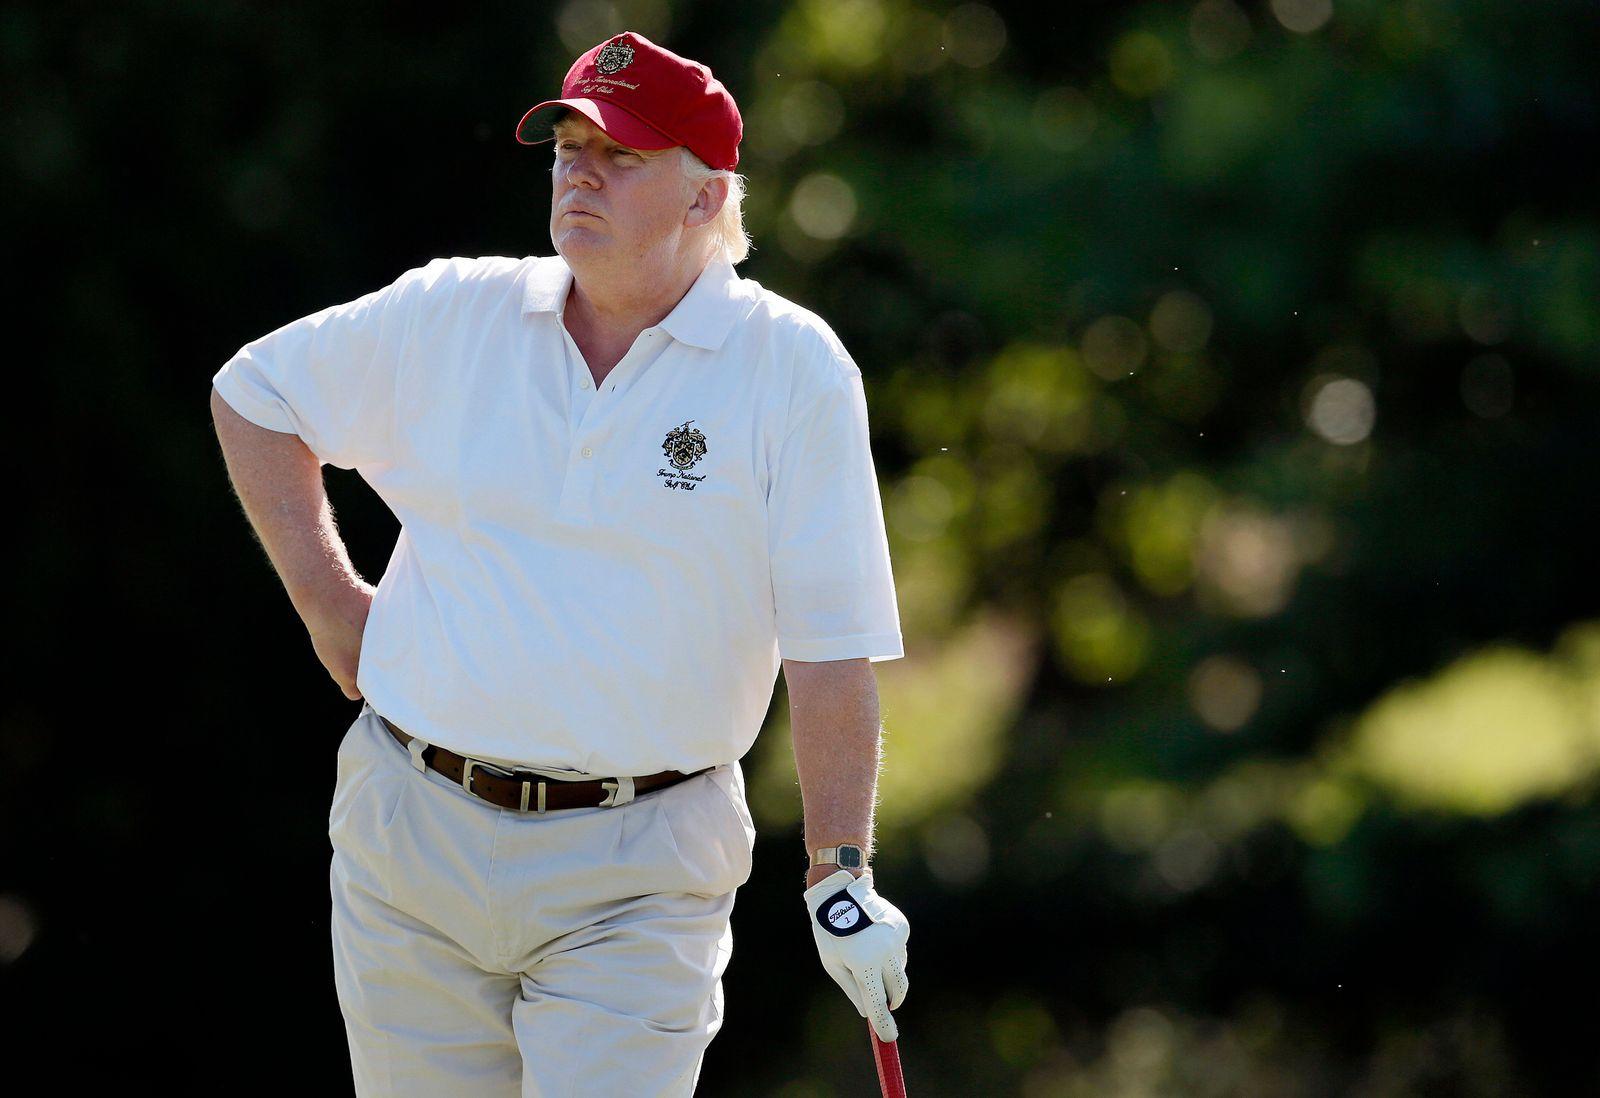 Trumps Golf Clubs